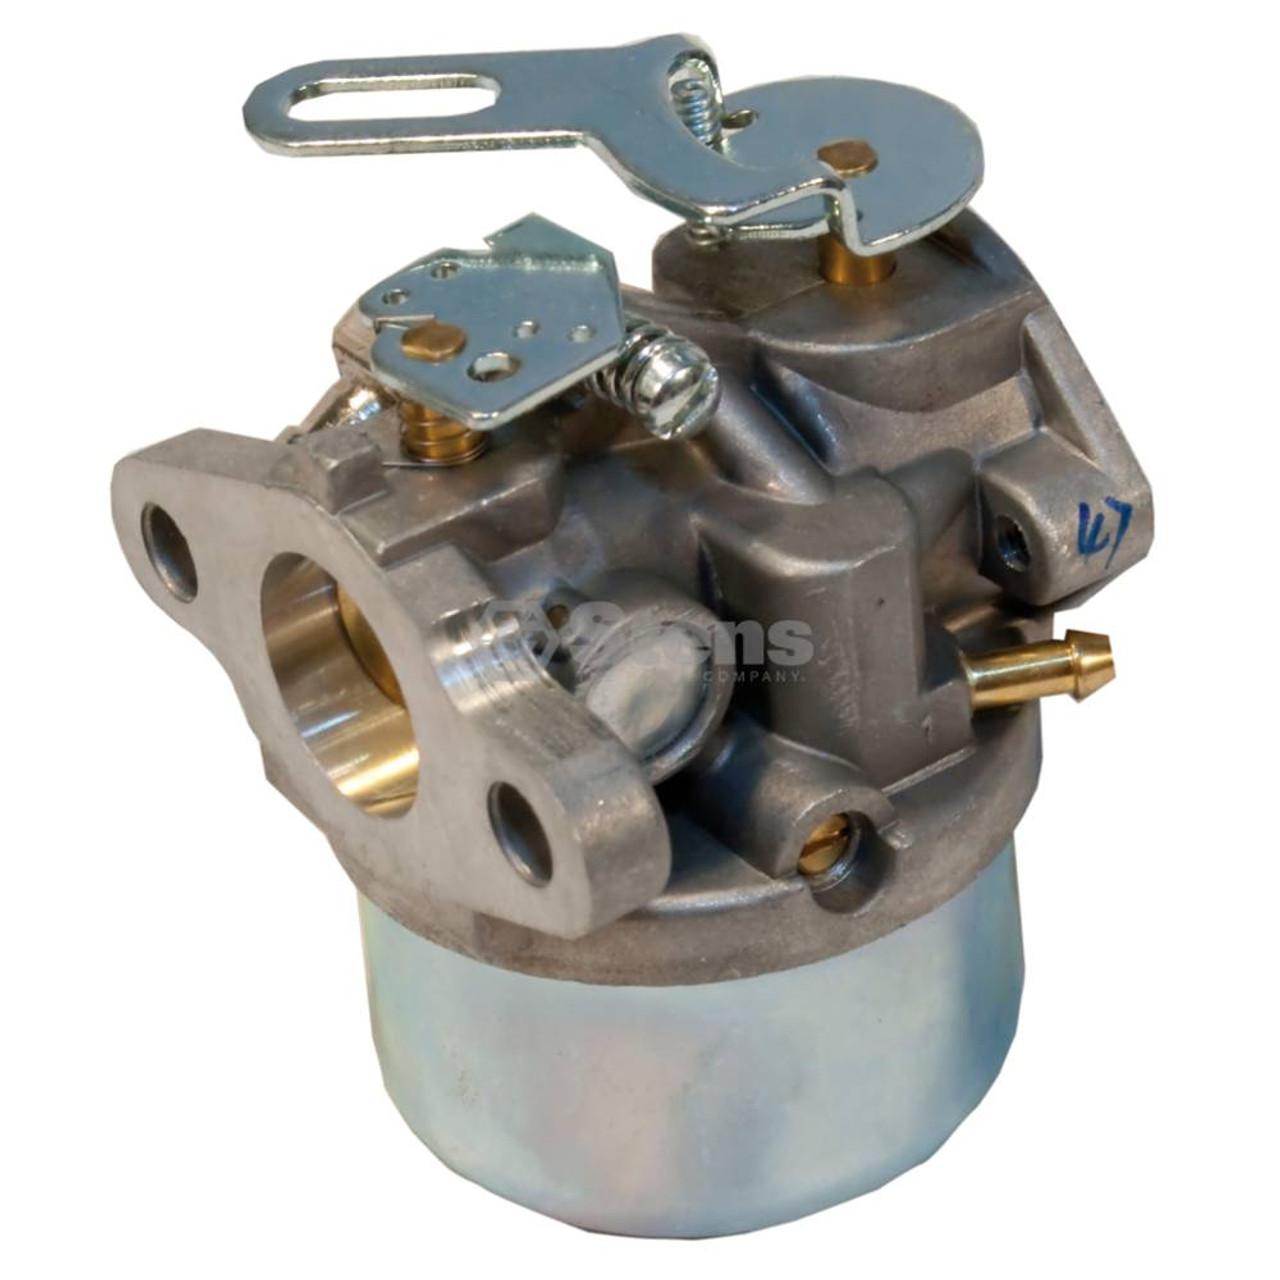 OEM PART#640084B NEW OEM SERVICE PART TECUMSEH ENGINE COMPLETE CARB ASSY